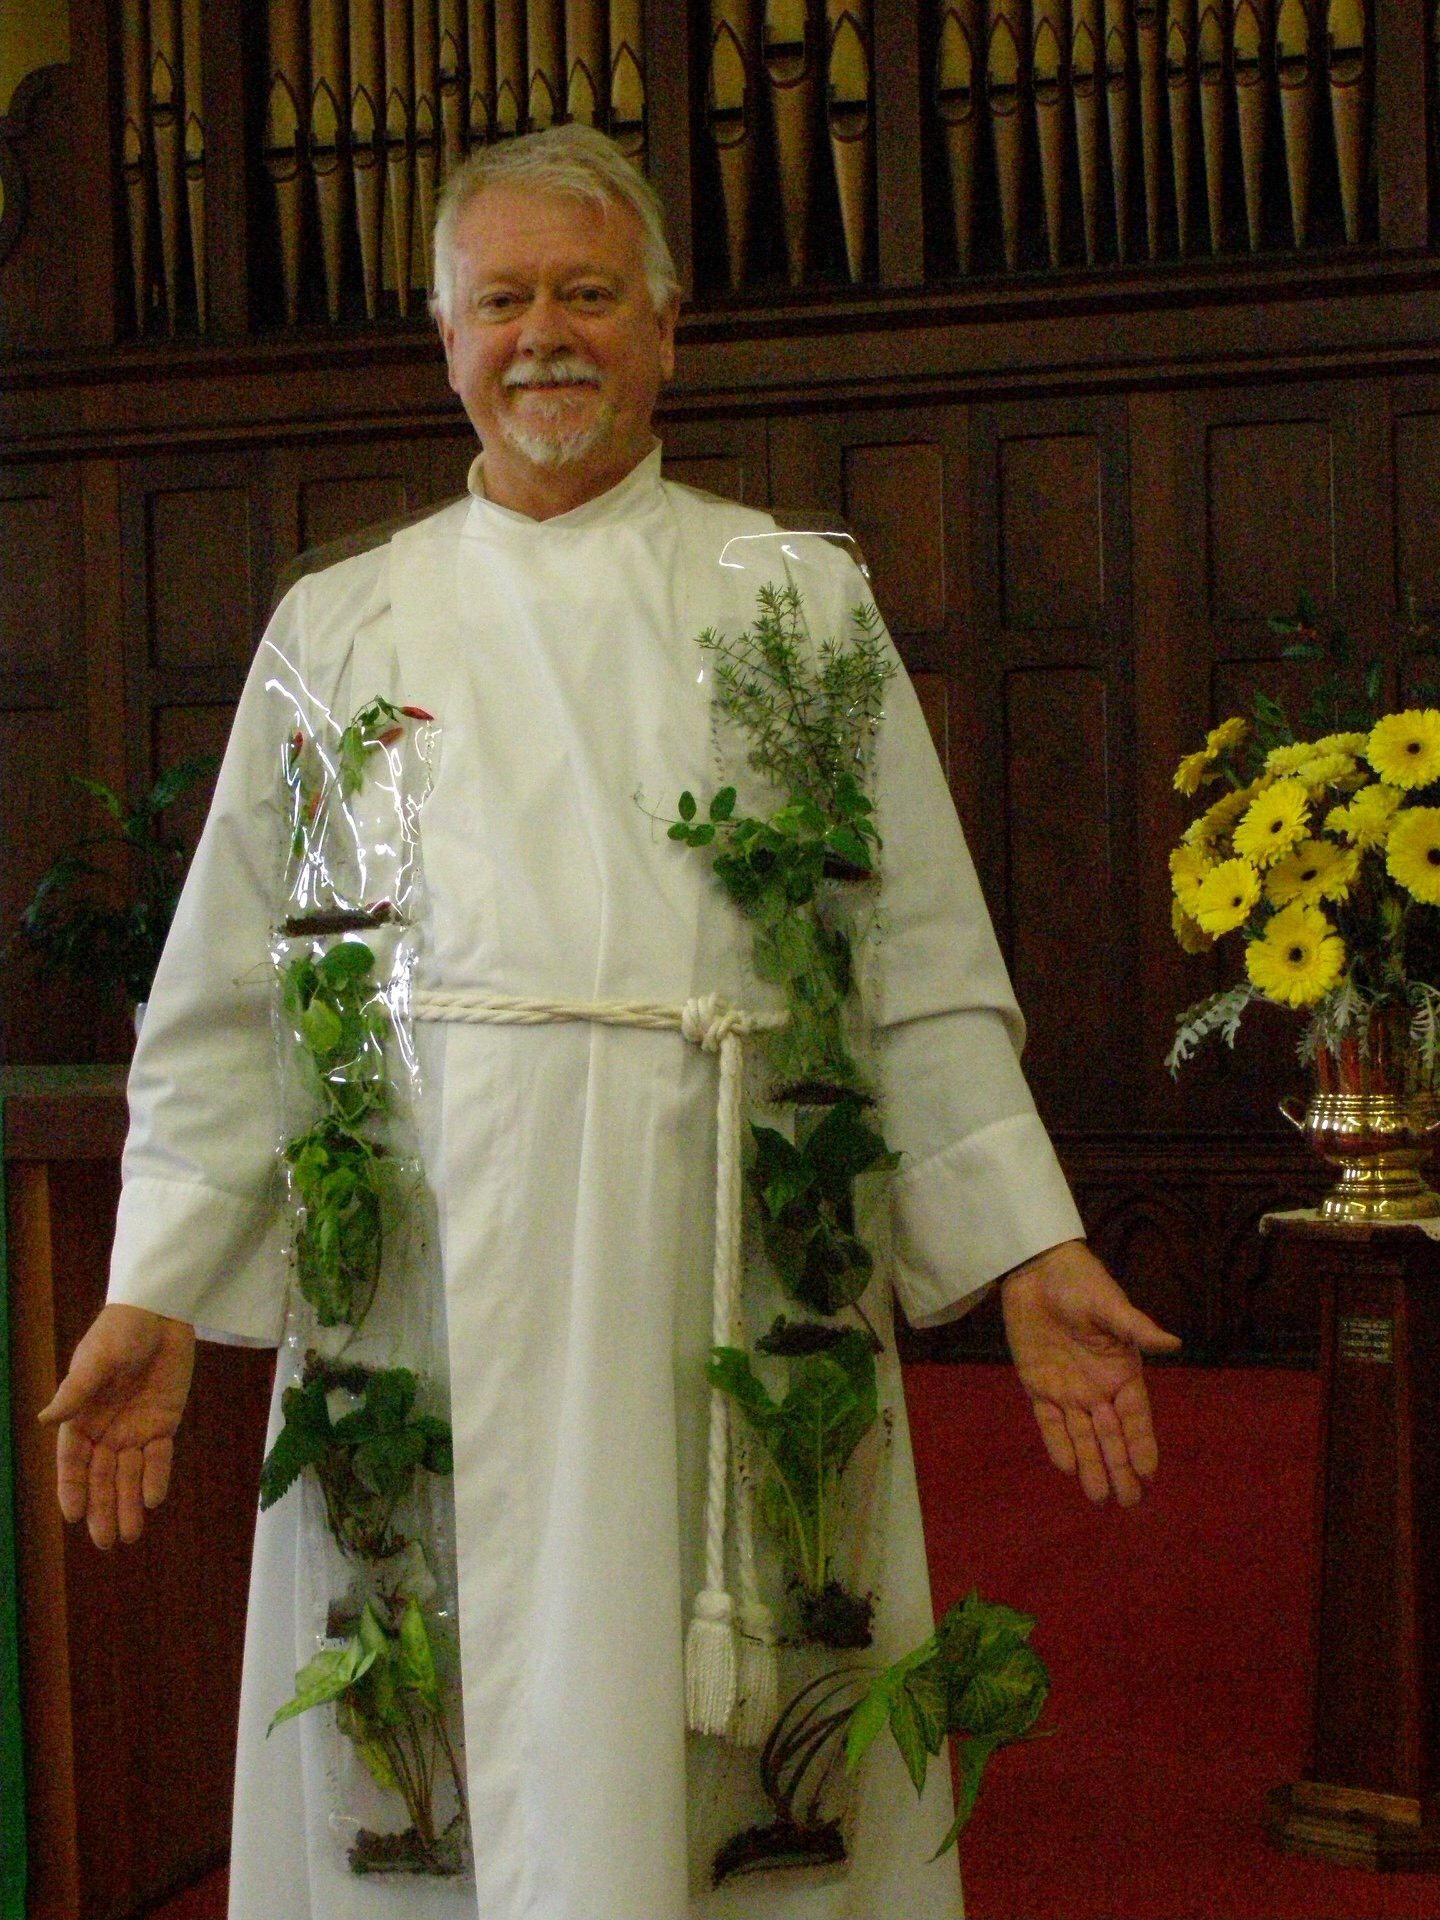 Rev Dr Rod Pattenden; photo taken on World Ecology Day